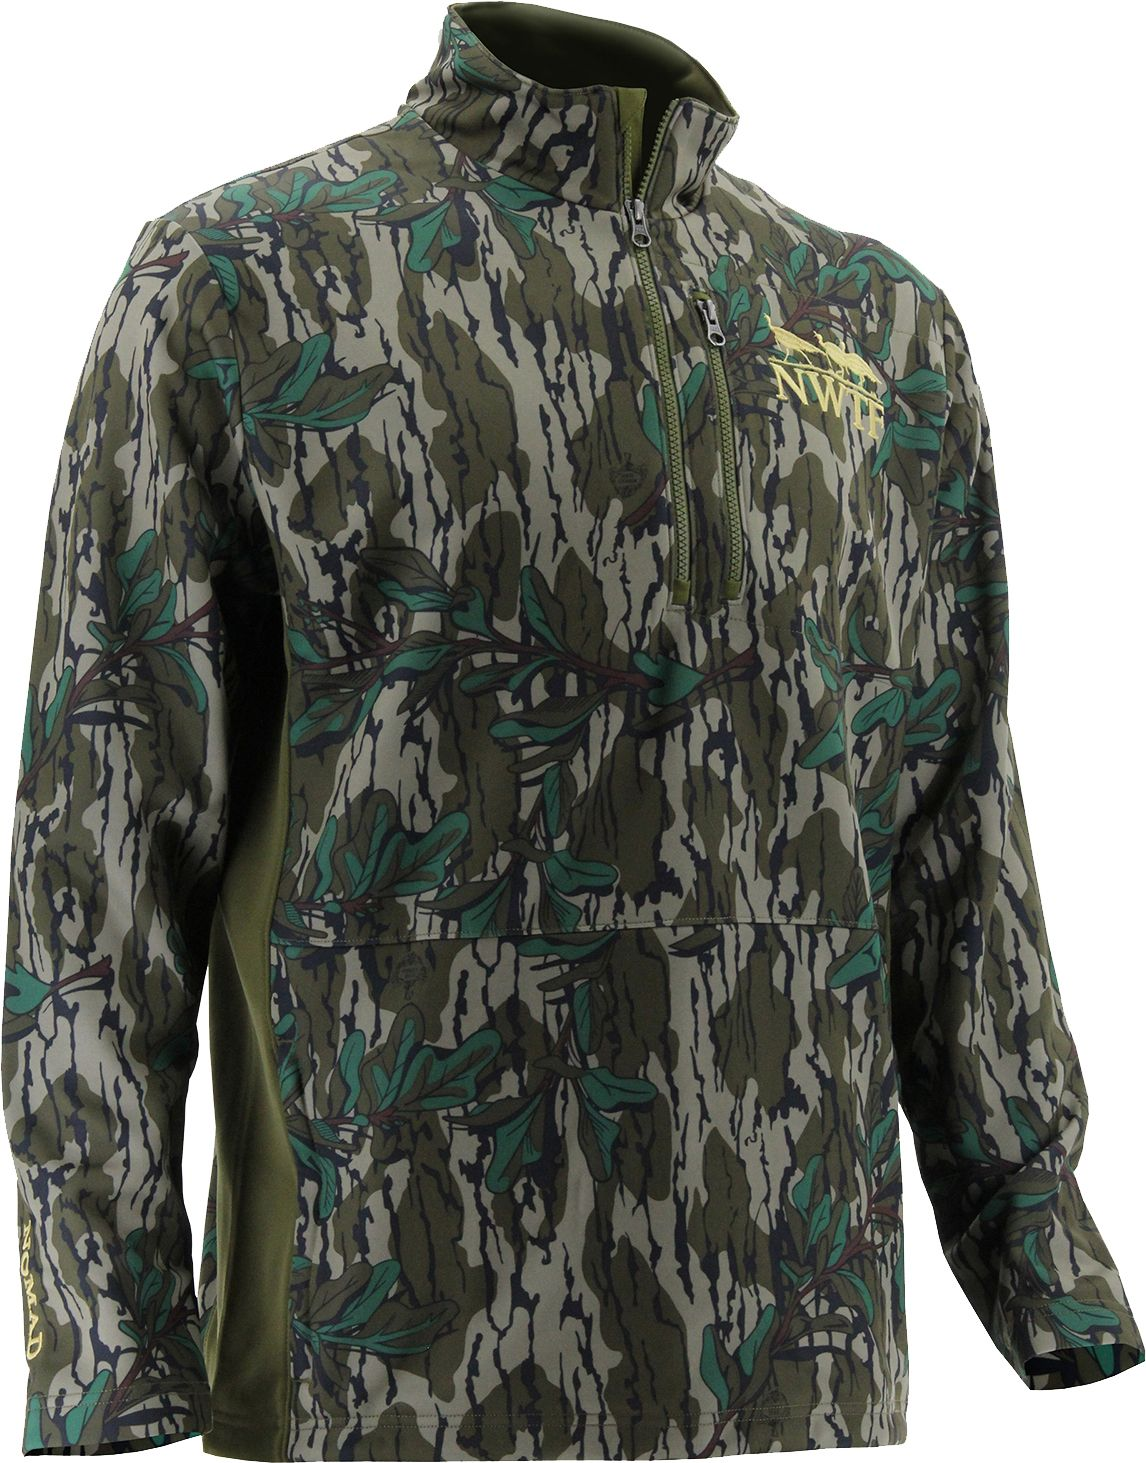 Nomad Men's Nwtf 1/4 Zip Fleece Hunting Jacket, Size: Medium, Mossy Oak Greenleaf thumbnail